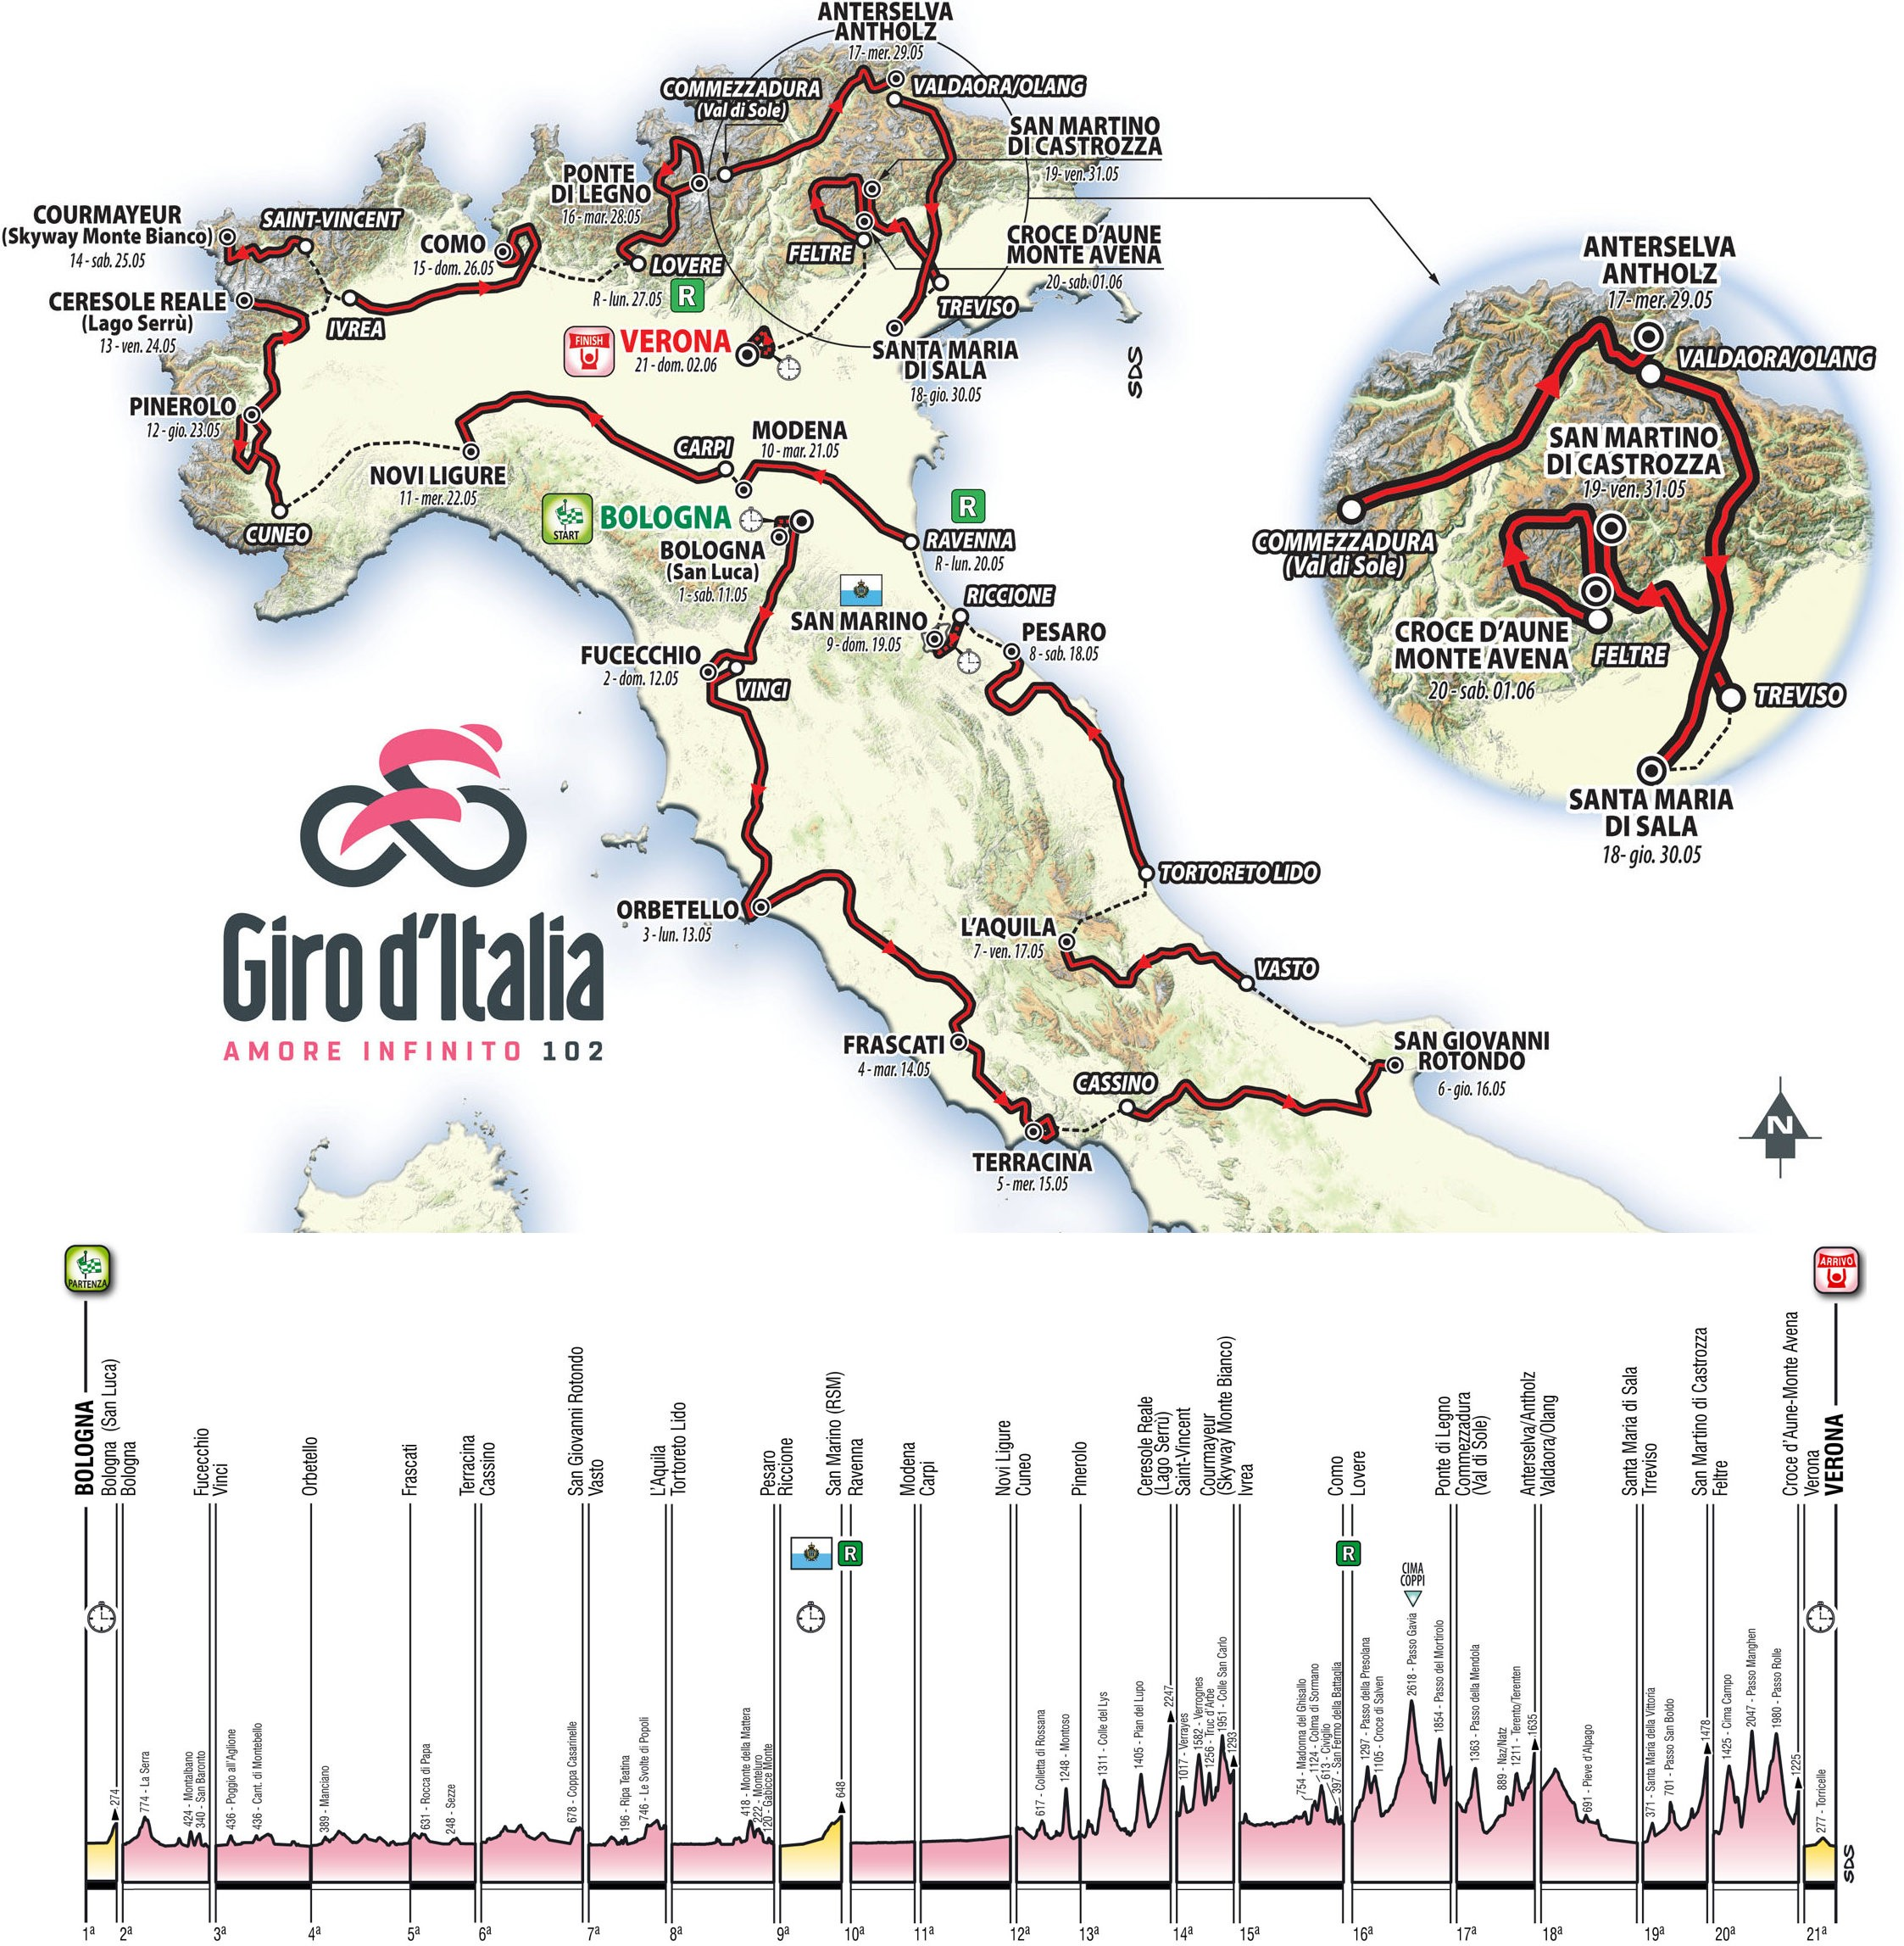 Calendario Colombia 2019 Colombia Más Caliente 2019 Giro D Italia Live Video Preview Startlist Route Results Of Calendario Colombia 2019 Colombia Actual 2019 Giro D Italia Live Video Preview Startlist Route Results